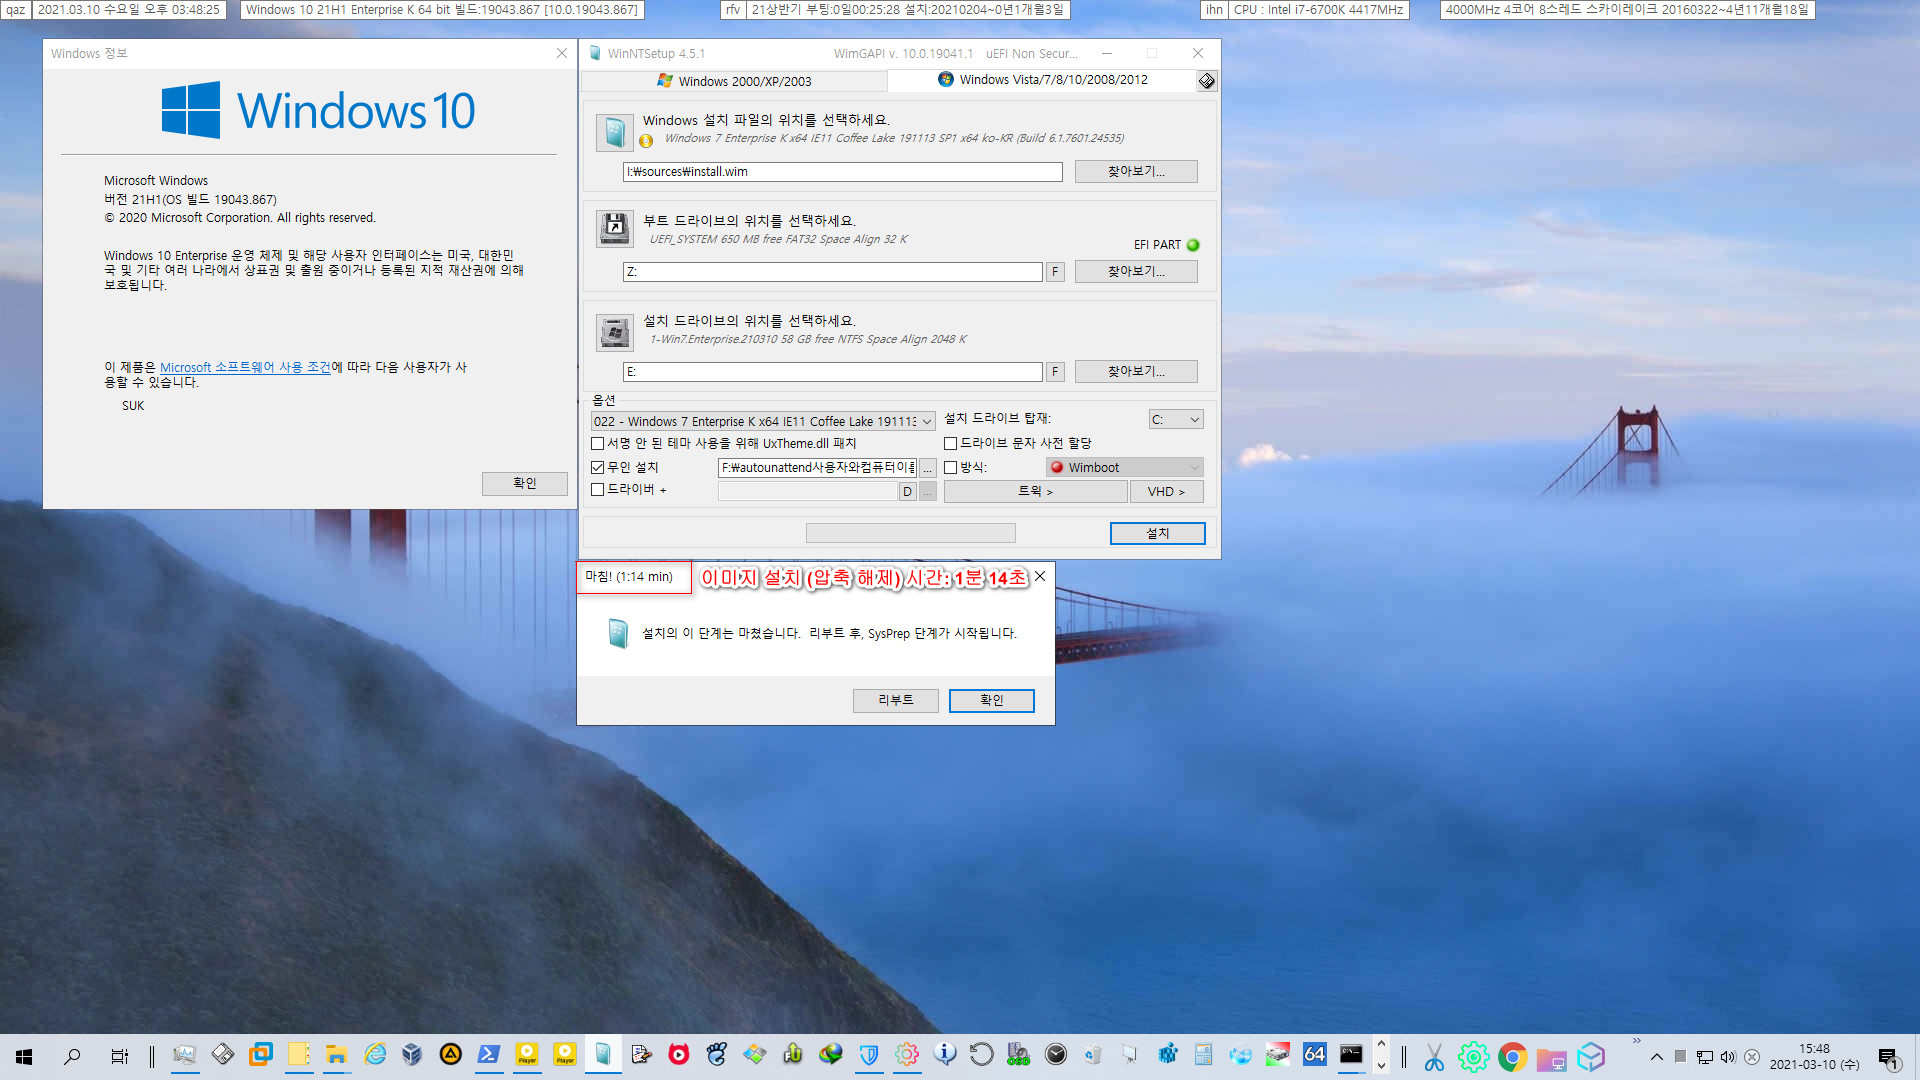 Windows 7을 실컴에 설치하여 절전모드 3가지가 잘 작동하는지 확인하고 최대 절전 파일 만드는 과정에 생긴 오류 문제 해결 2021-03-10_154825.jpg